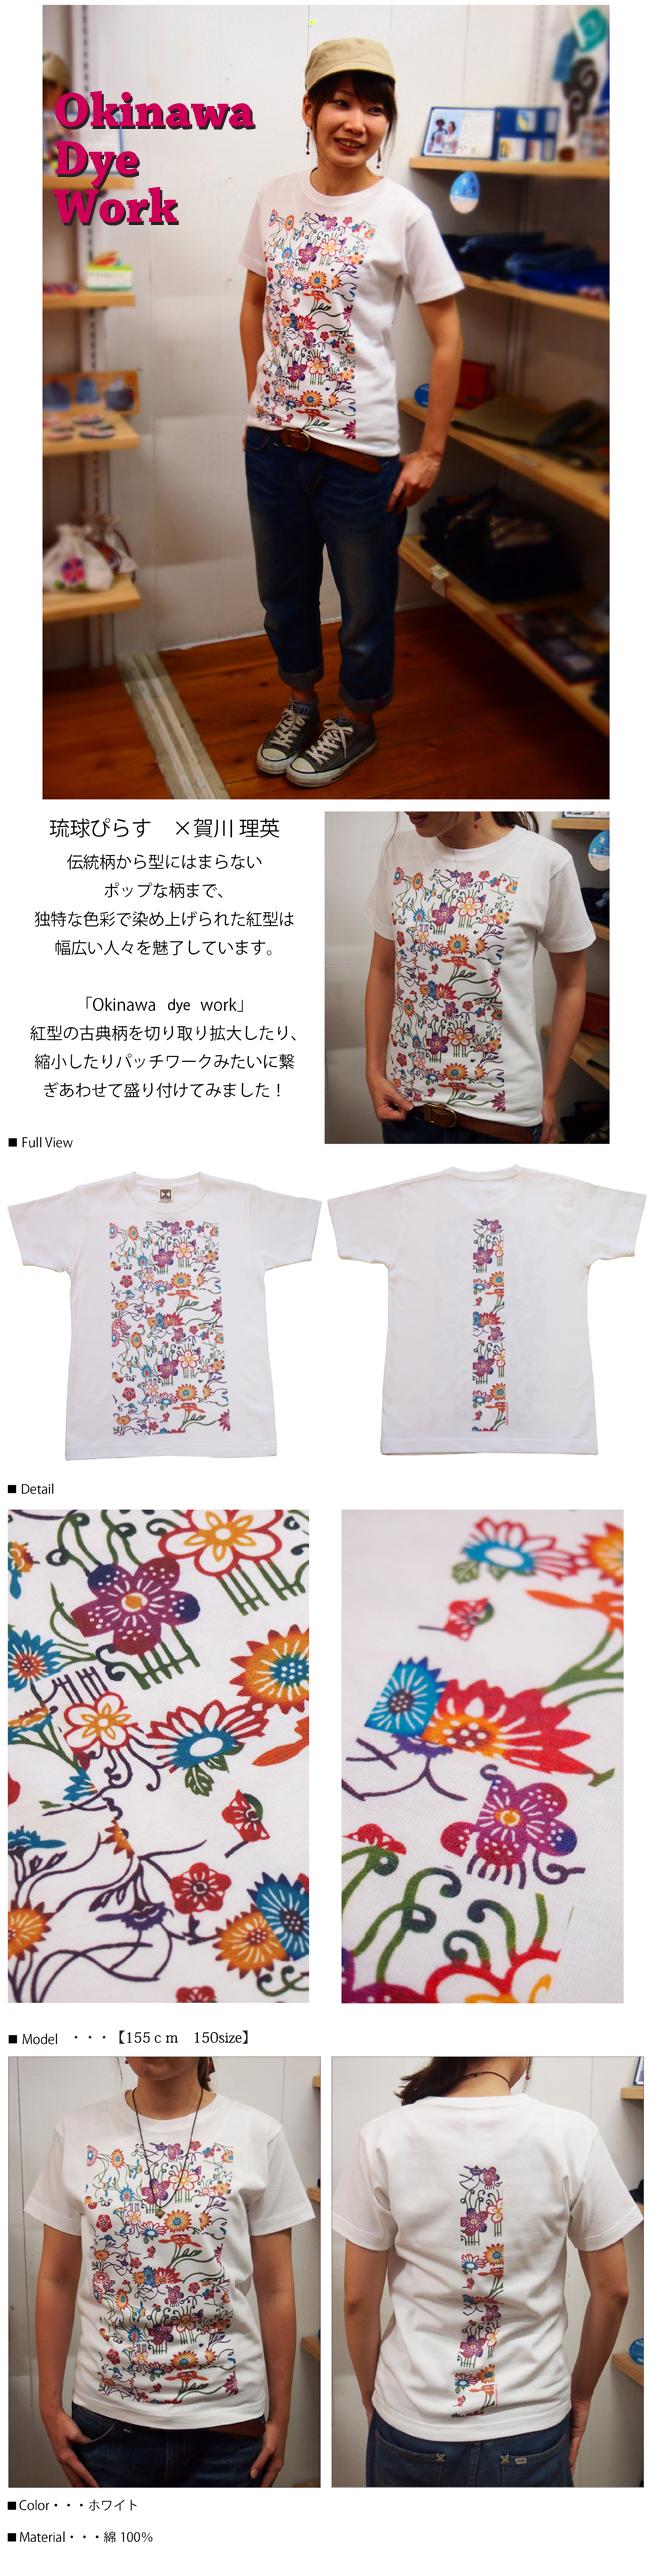 okinawa dye work